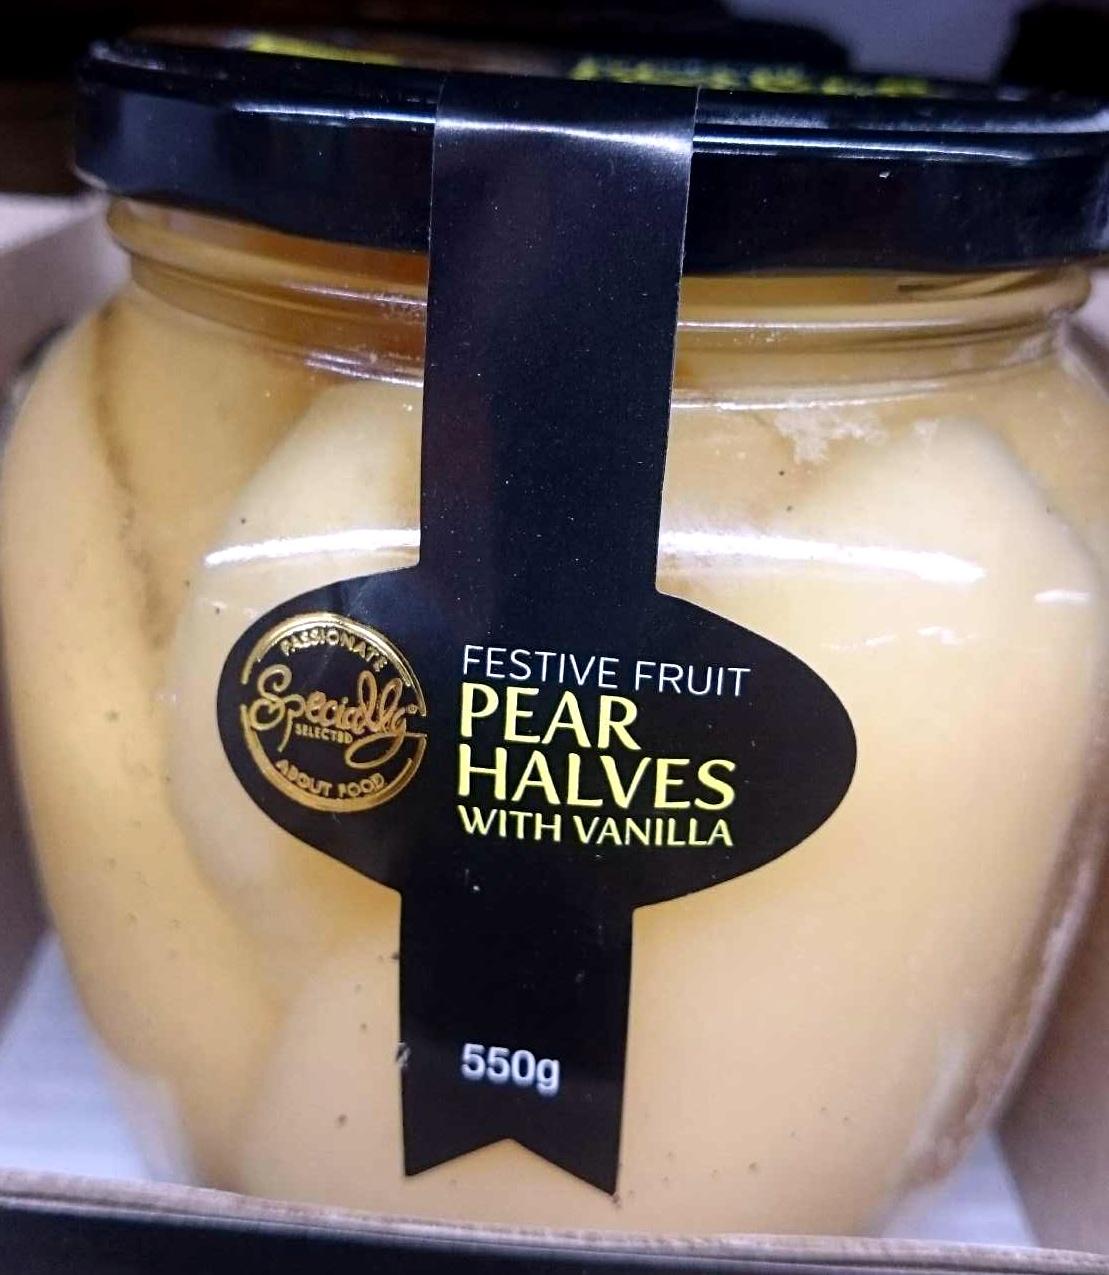 Festive Fruit Pear Halves With Vanilla - Product - en